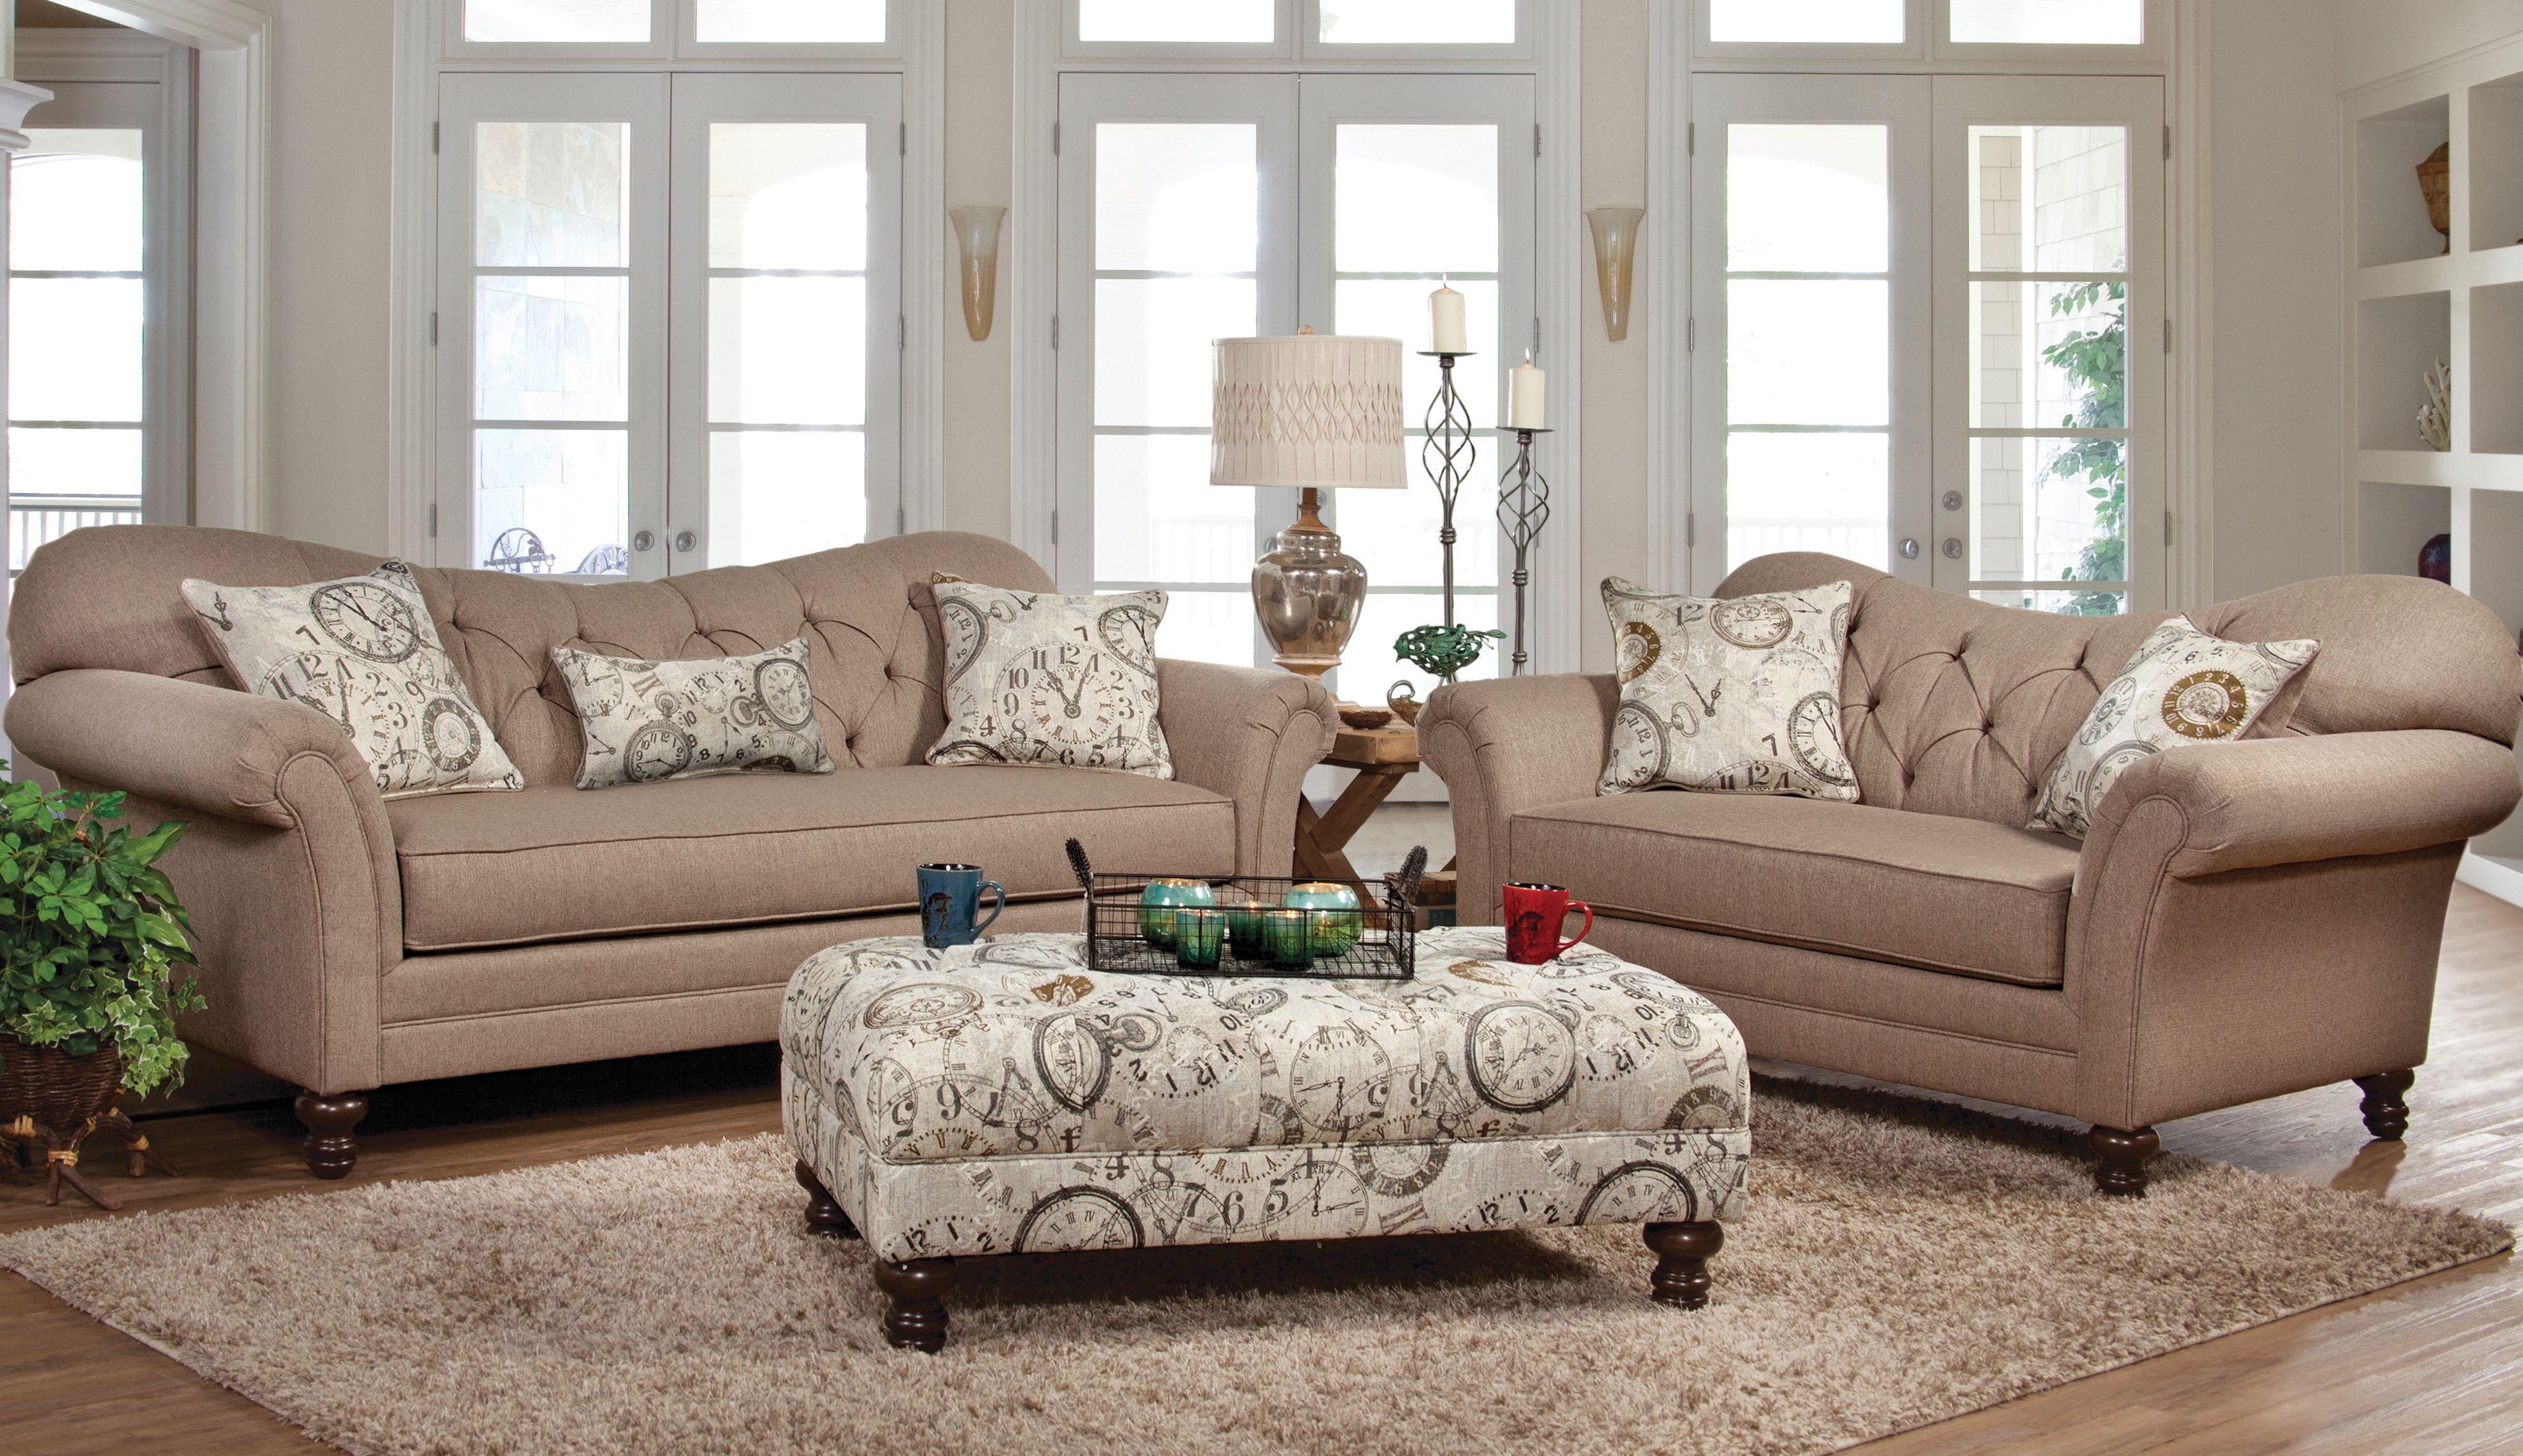 Serta Upholstery By Hughes Sofa Loveseat And Ottoman Cushions